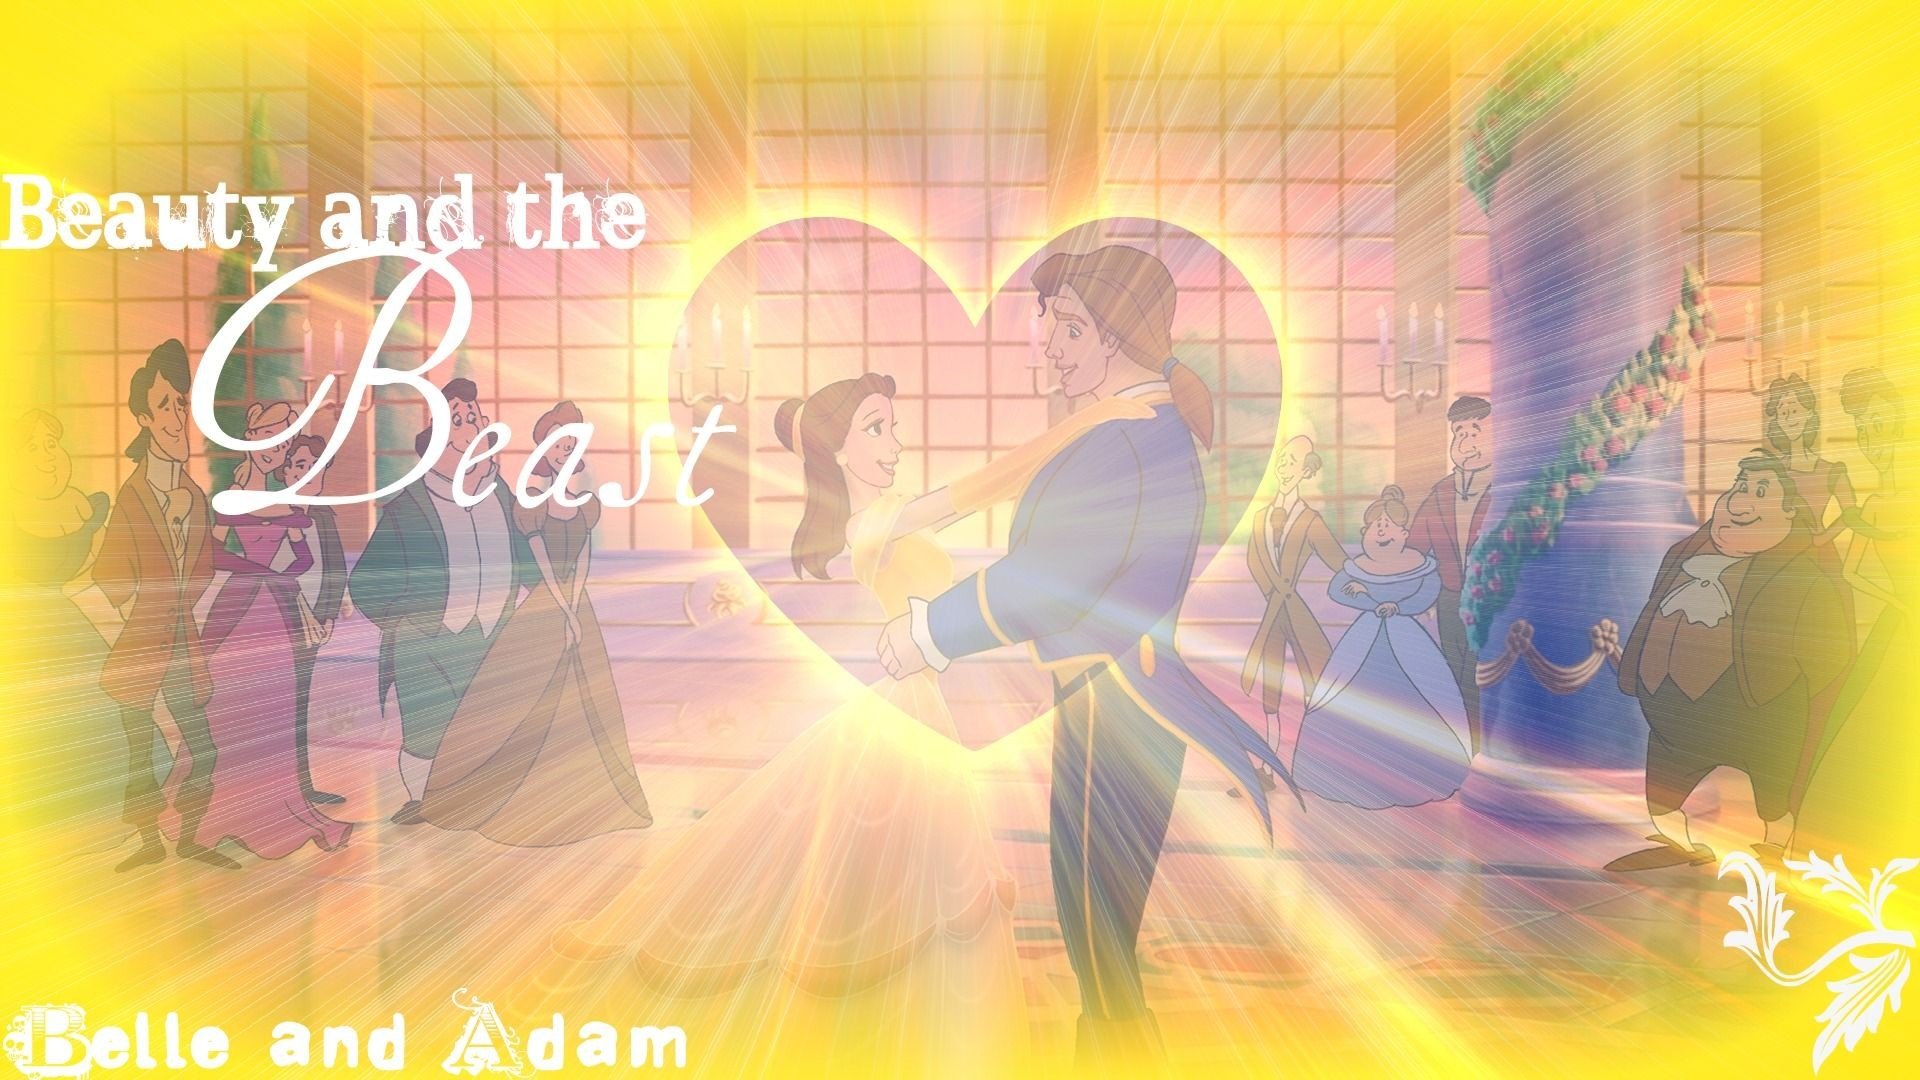 Res: 1920x1080, Princess Belle and Prince Adam | Disney Princess Belle and The Prince(Adam)  | Ƹ̵̡Ӝ̵̨̄Ʒ Beauty And The Beast Ƹ̵̡Ӝ̵̨̄Ʒ | Pinterest | Disney princess belle,  ...